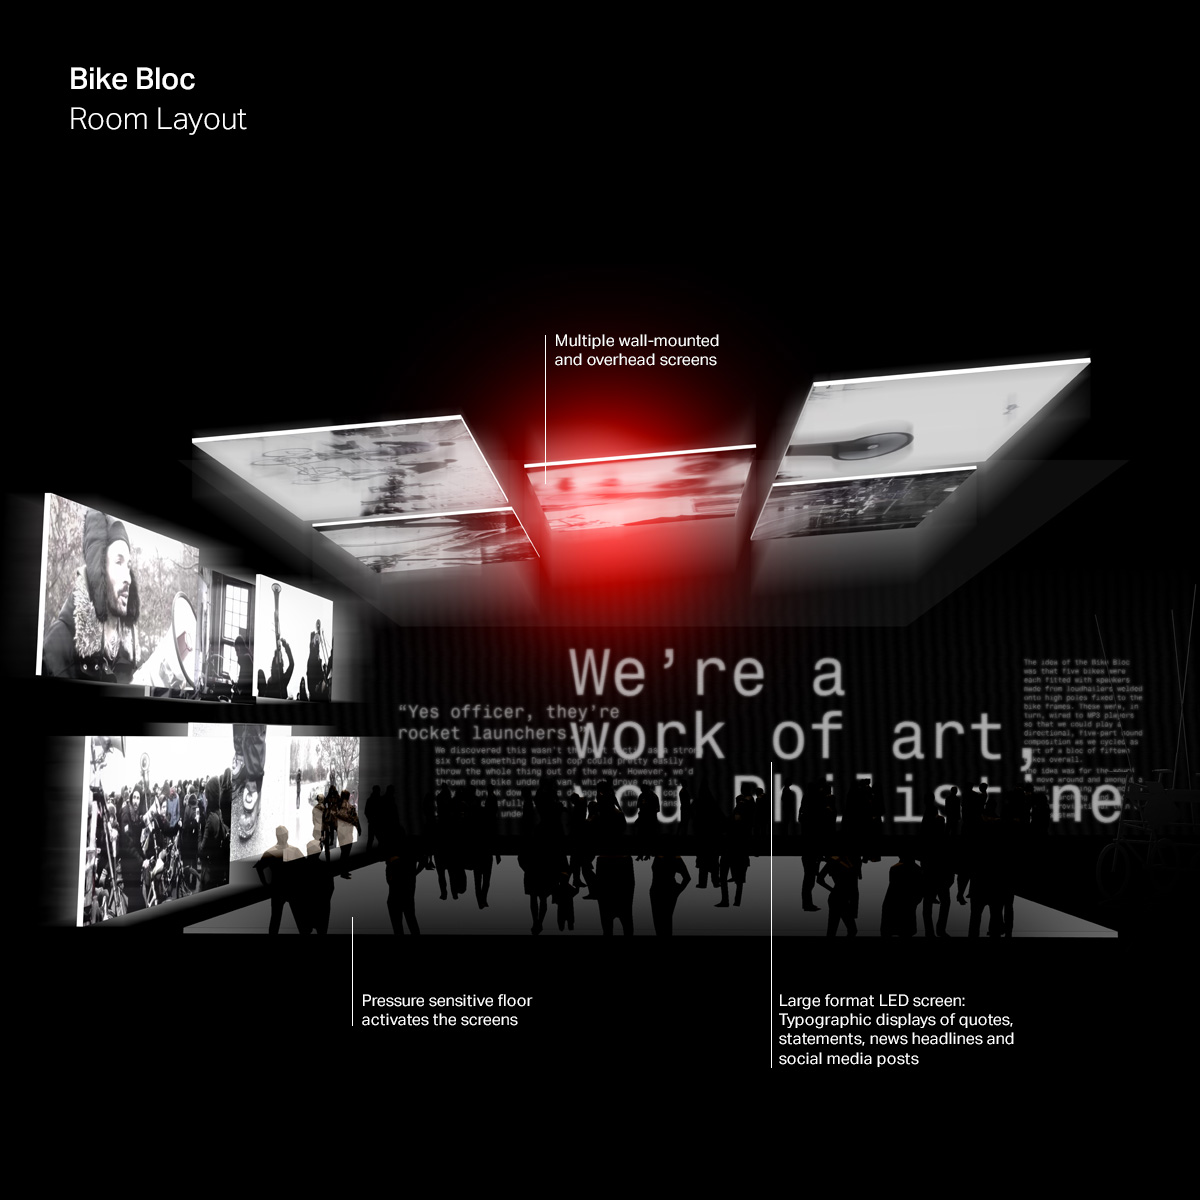 Graduate-Showcase-Images-Bike-Bloc